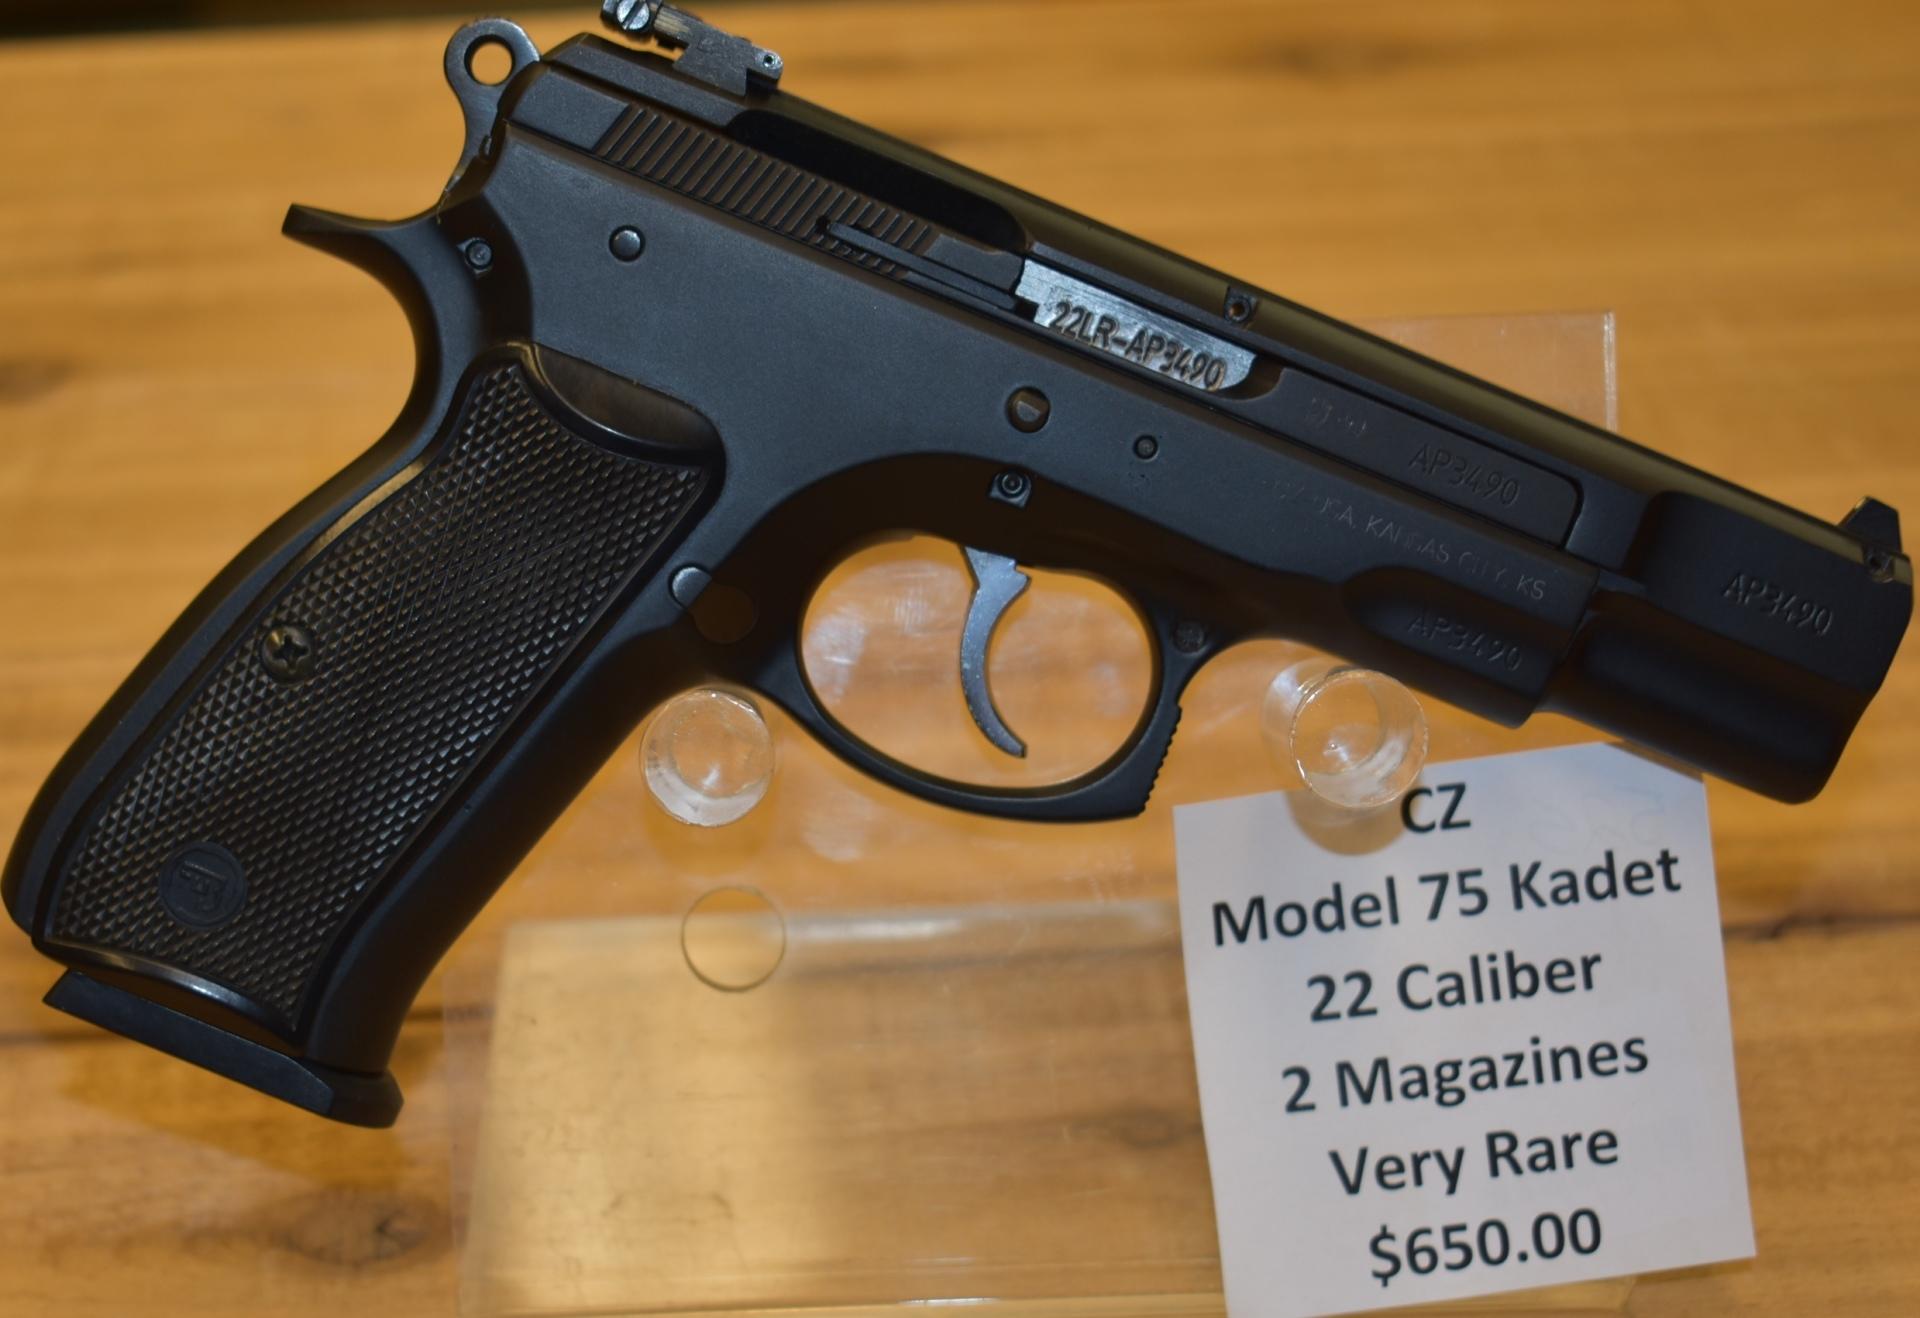 CZ Kadet model 75